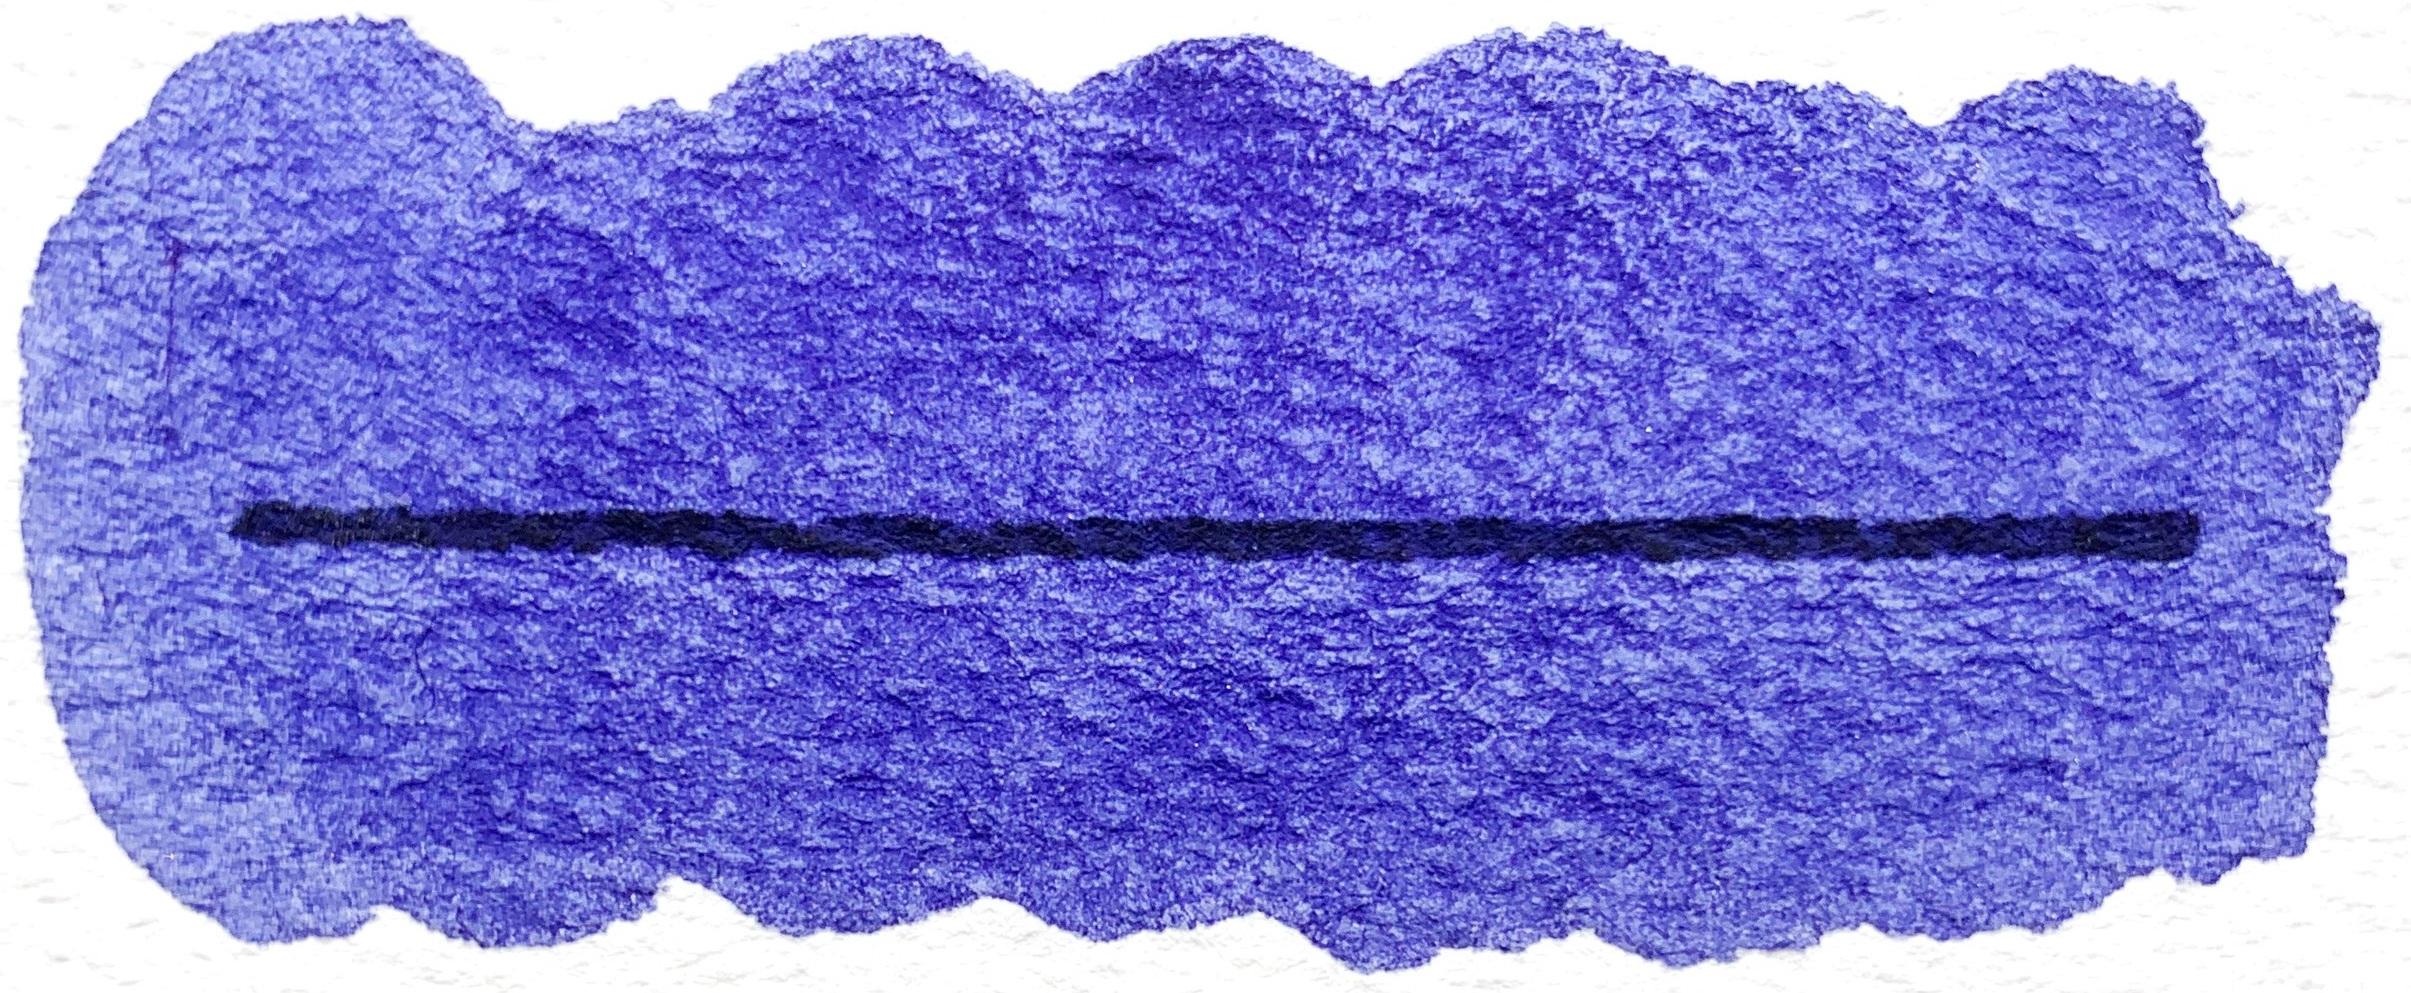 Mayan Violet - PV58, transparent, good lightfastness, mildly staining